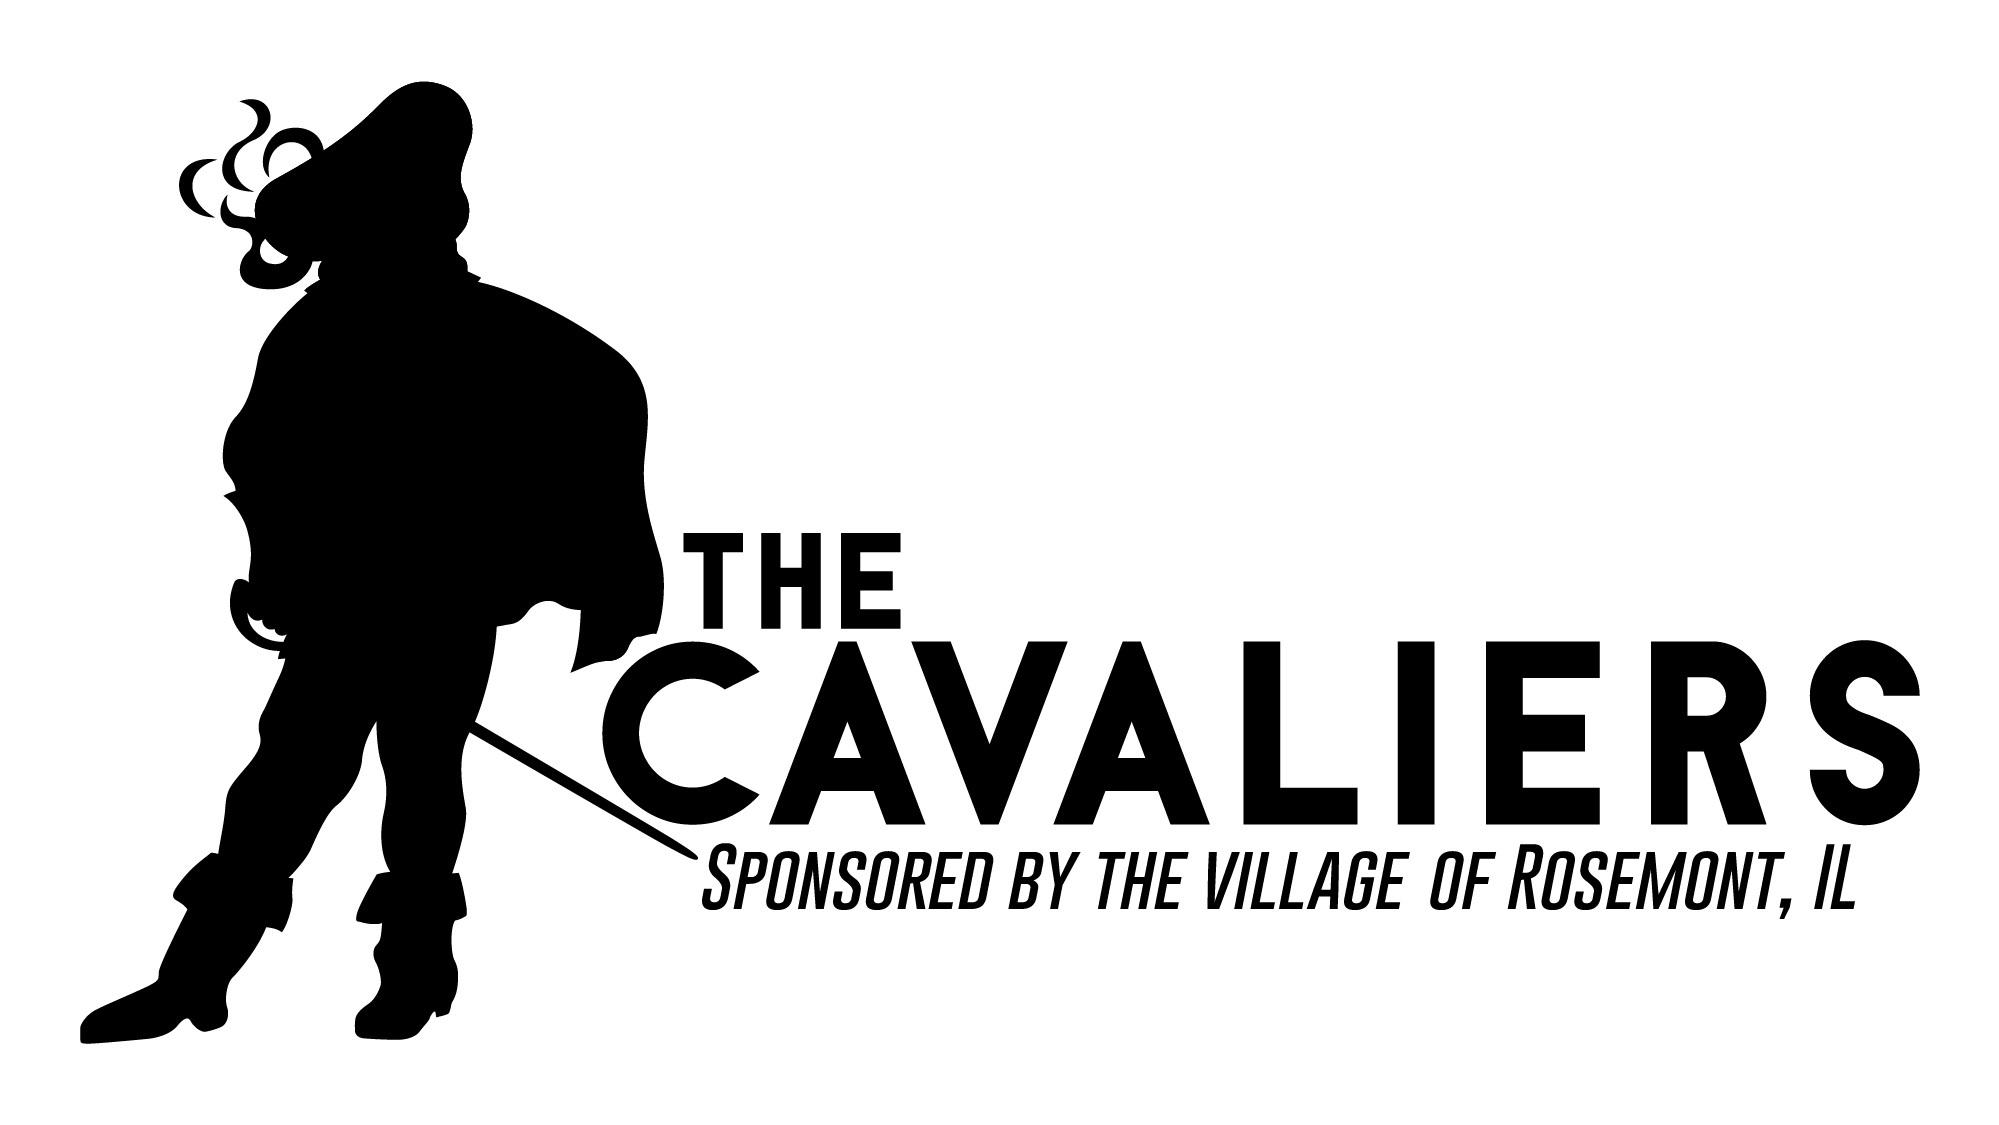 Cavaliers%2BLogo%2B%2528New%2529-01.jpg